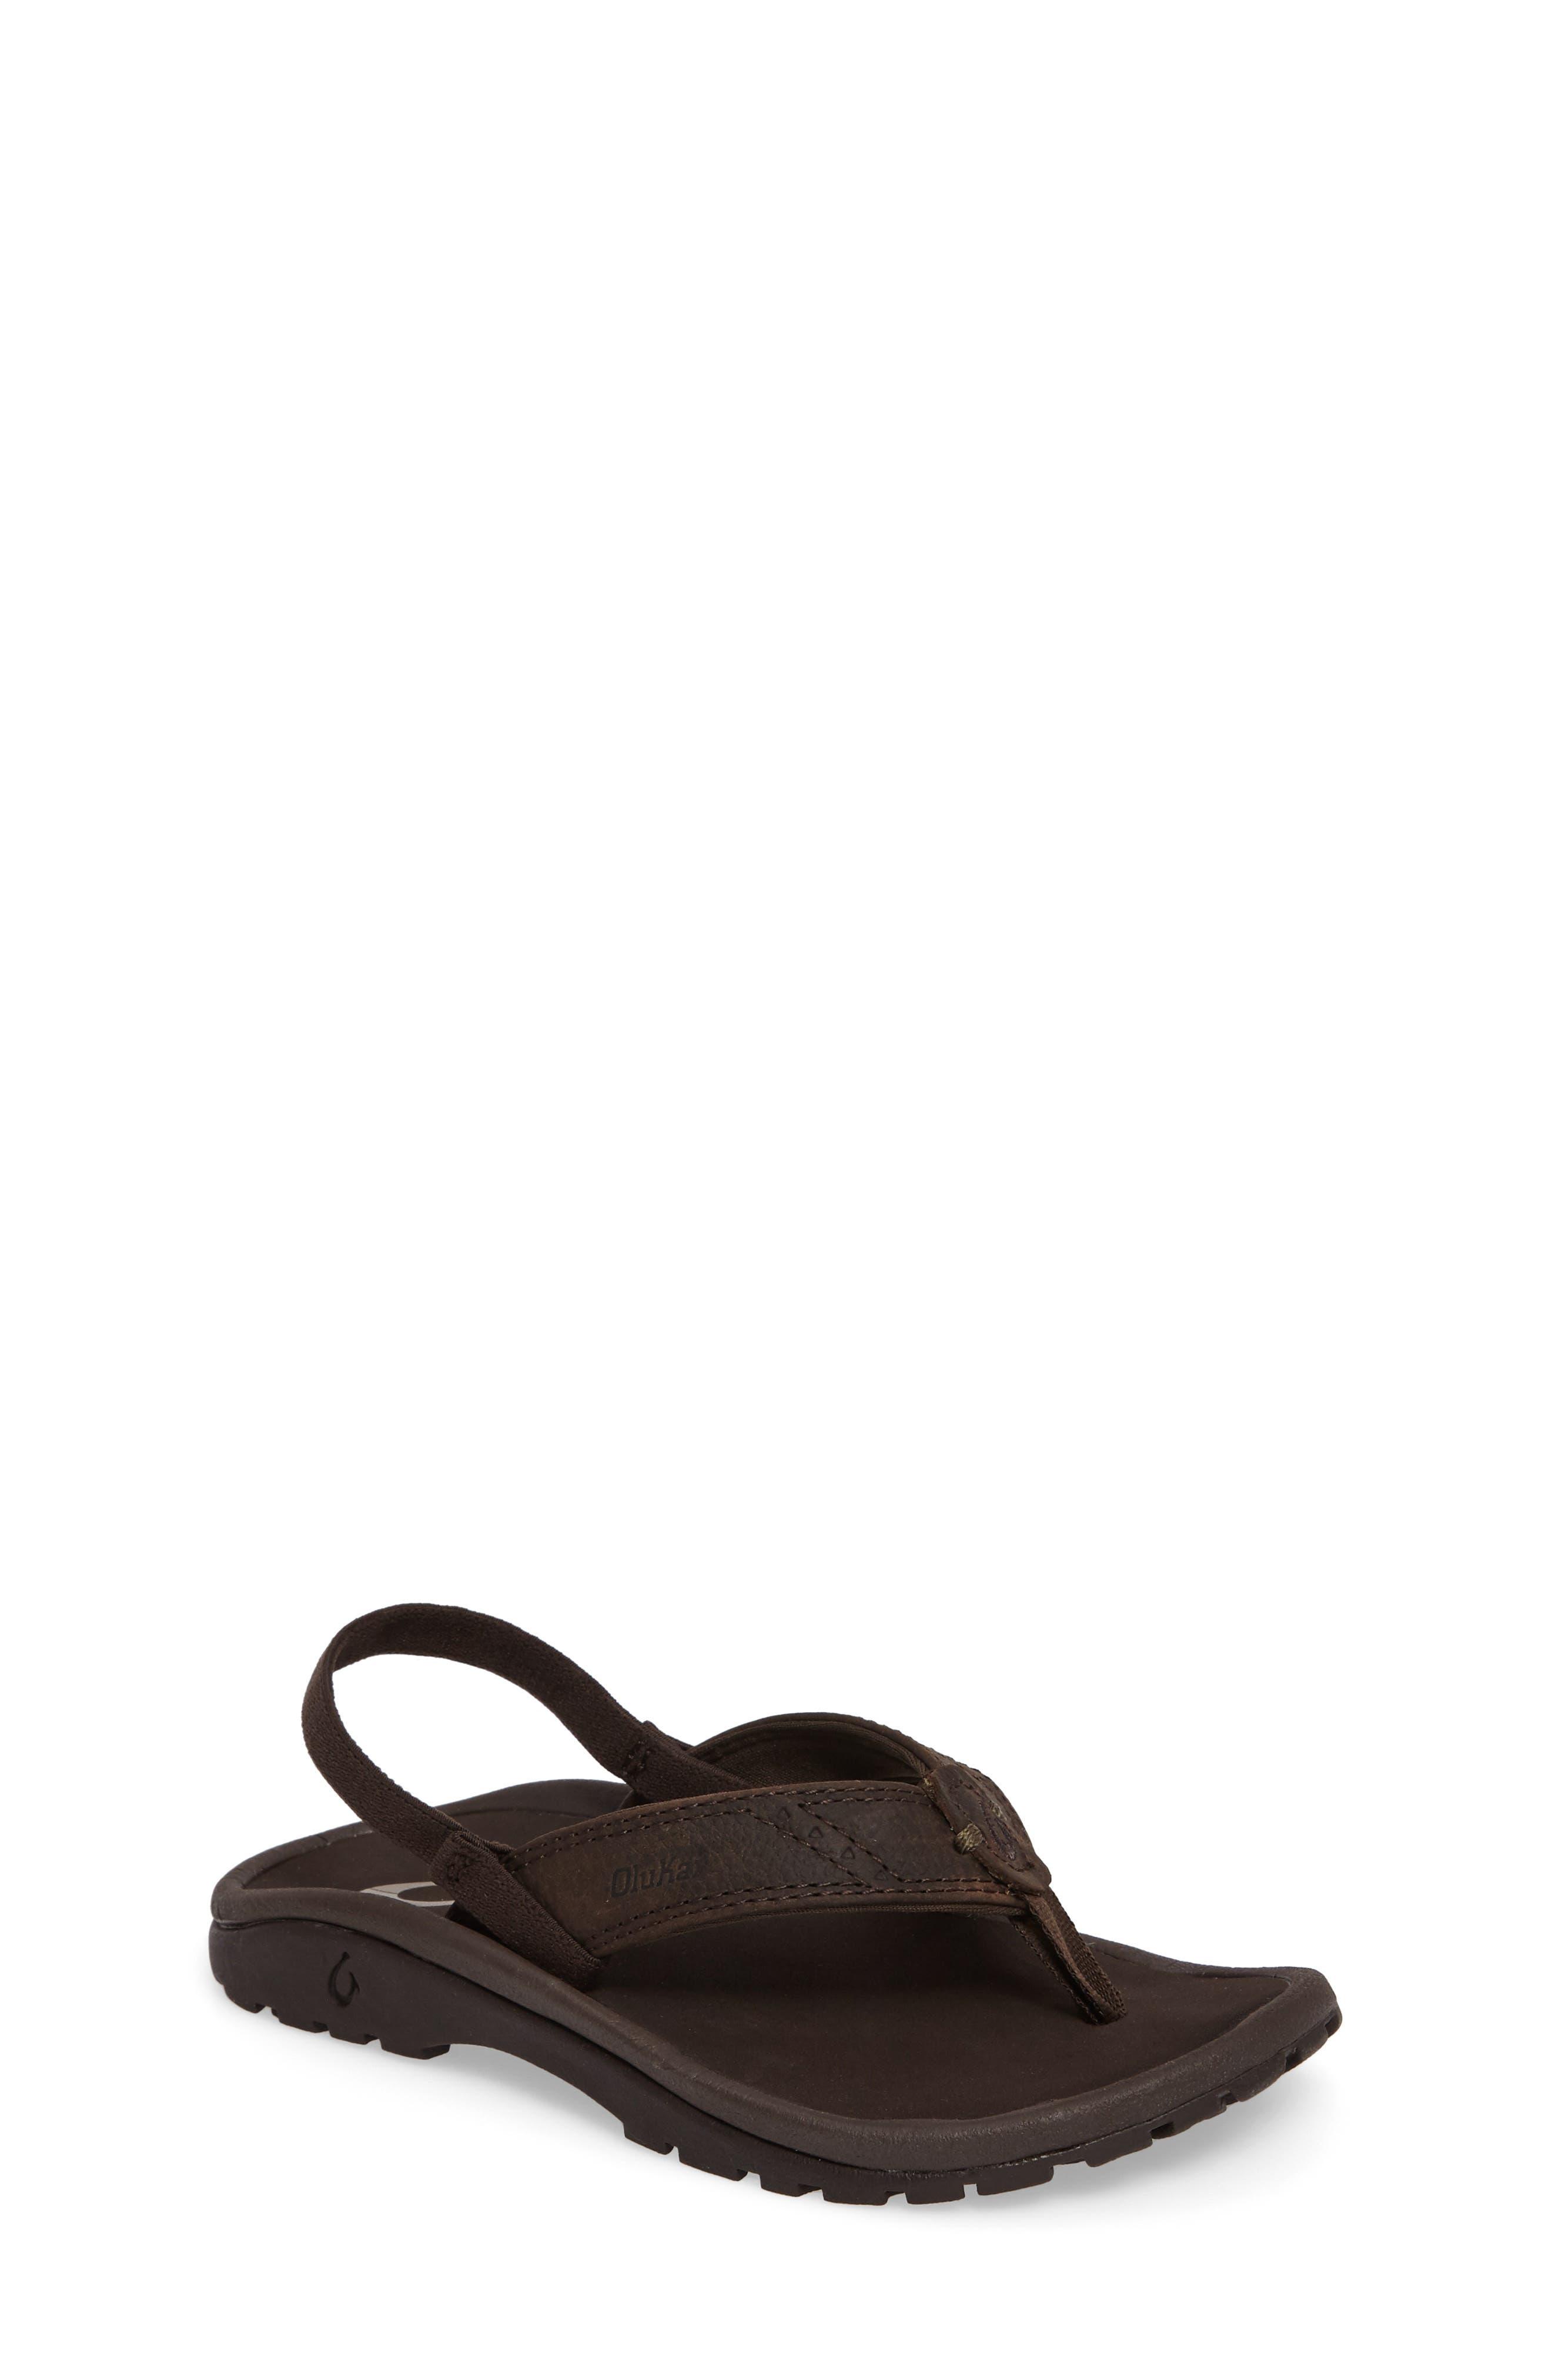 Main Image - OluKai Nui Leather Sandal (Toddler)